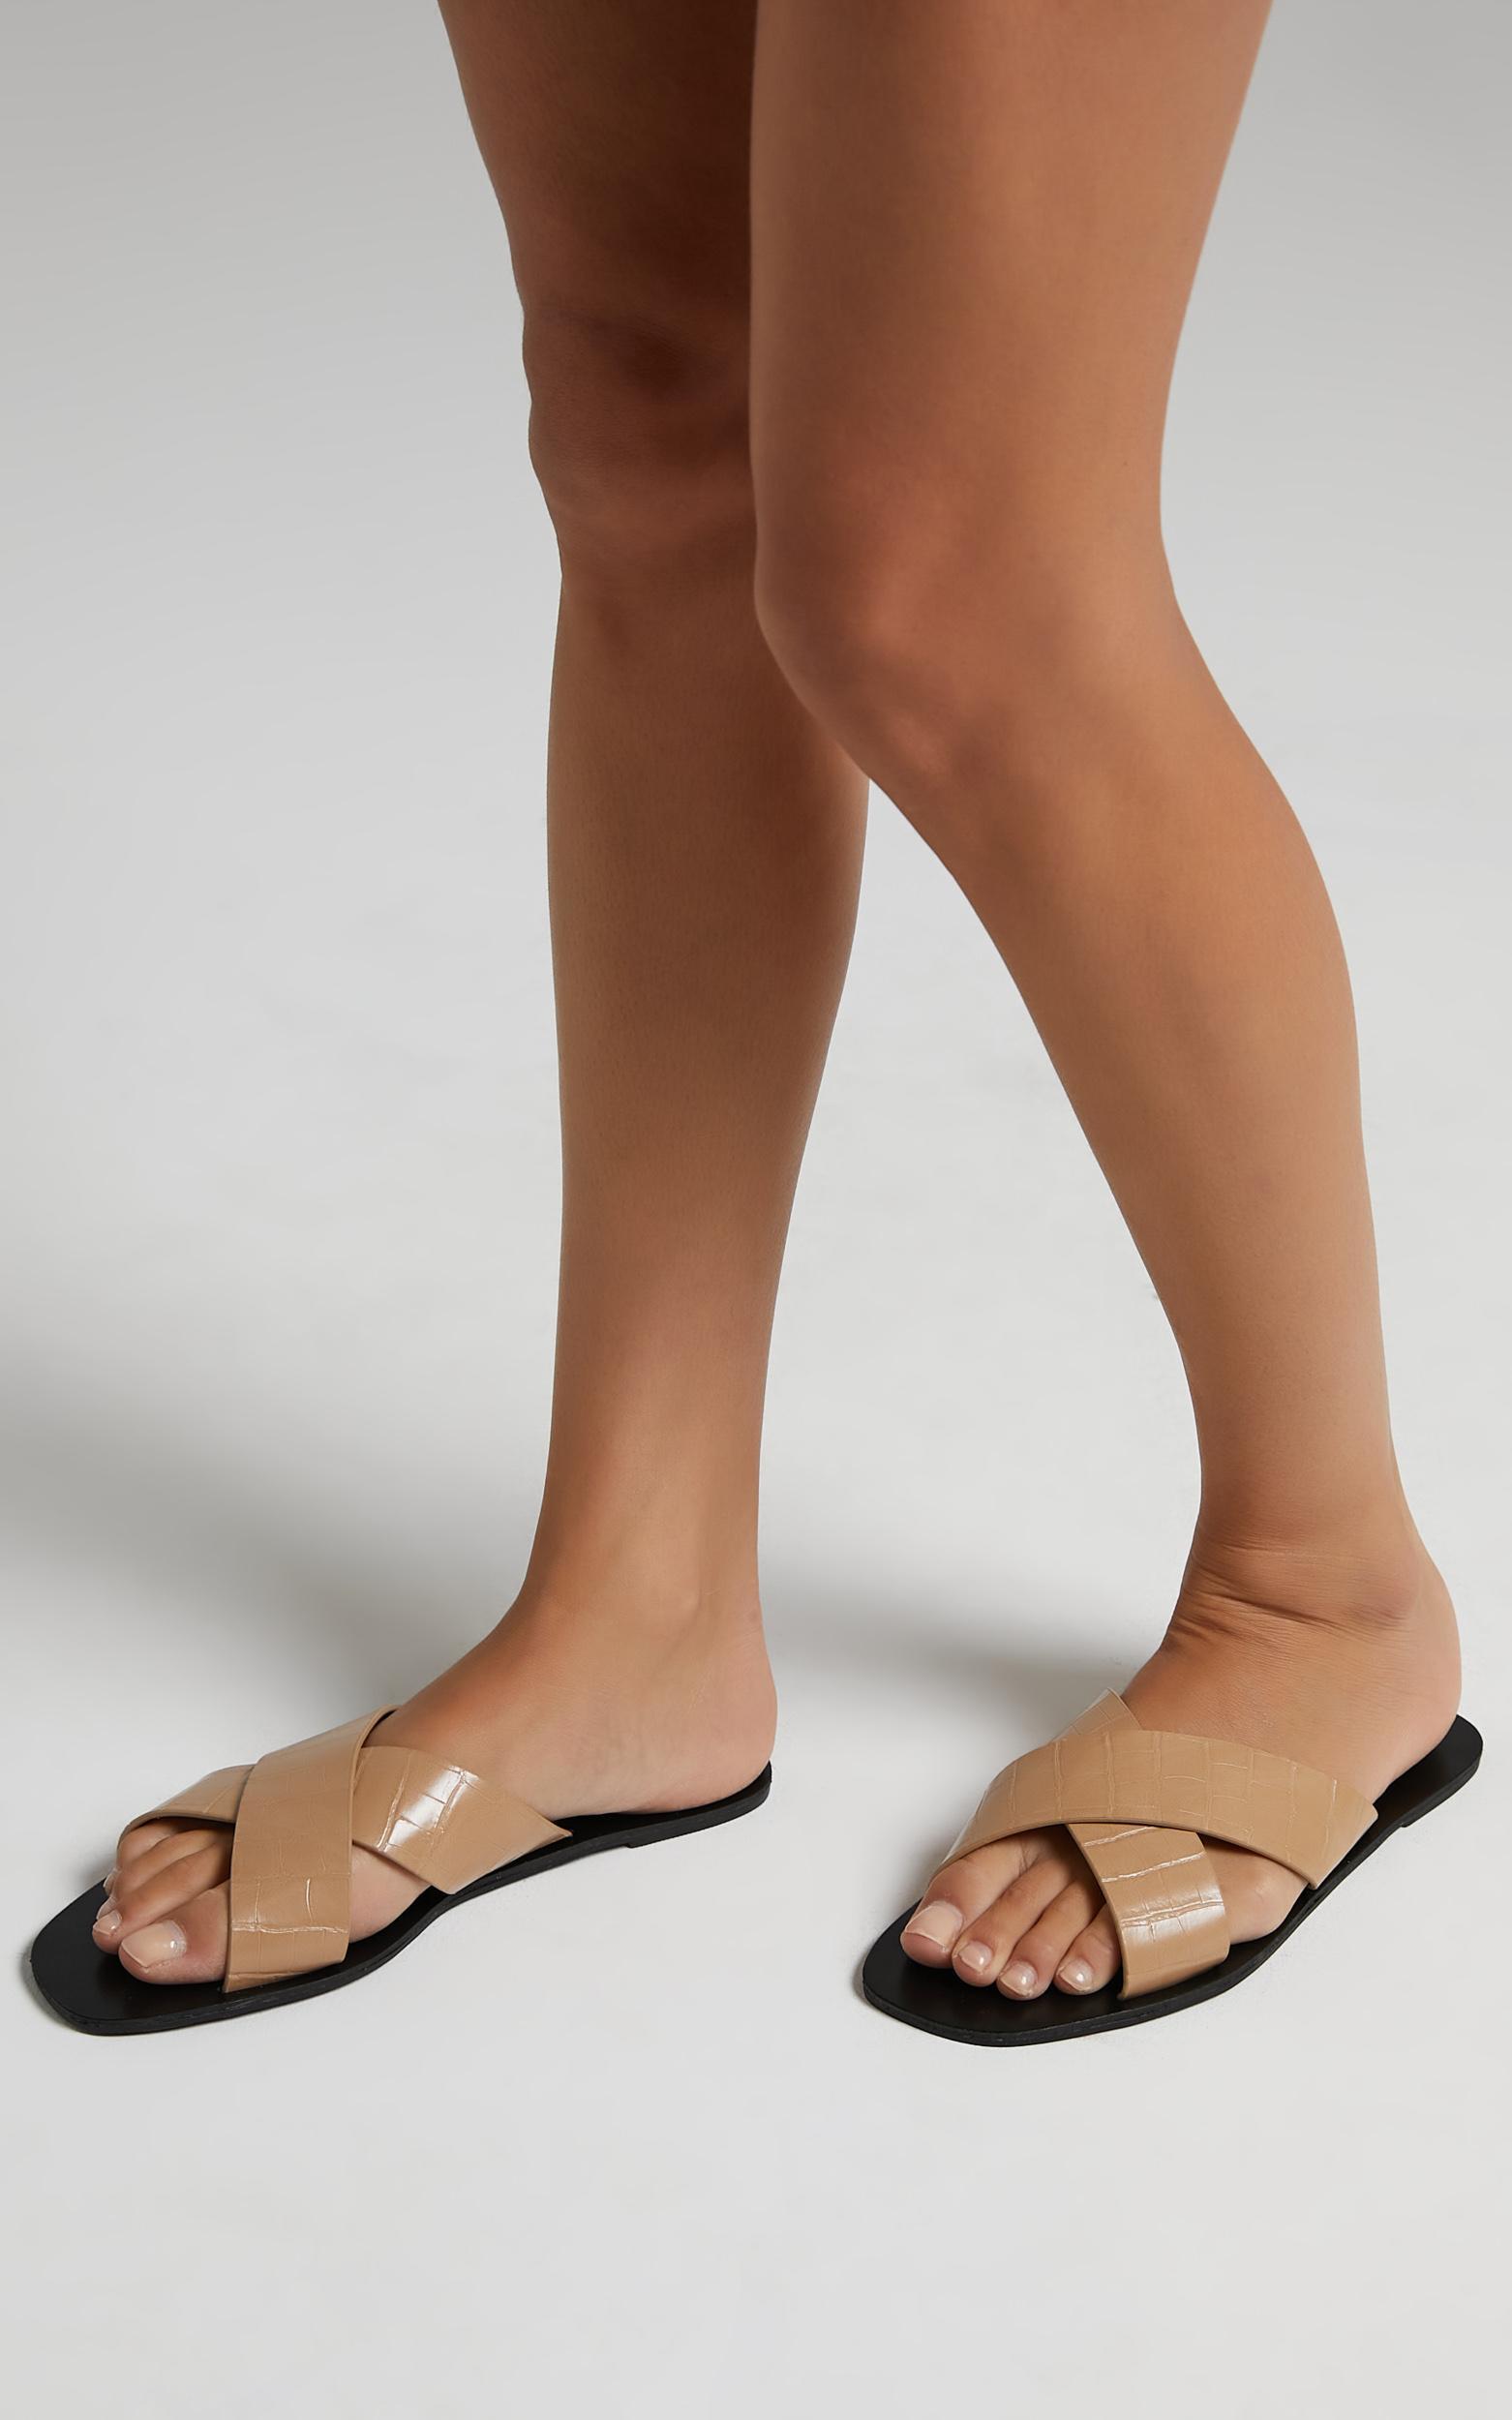 Billini - Hale Sandals in Clay Croc - 05, BRN2, hi-res image number null